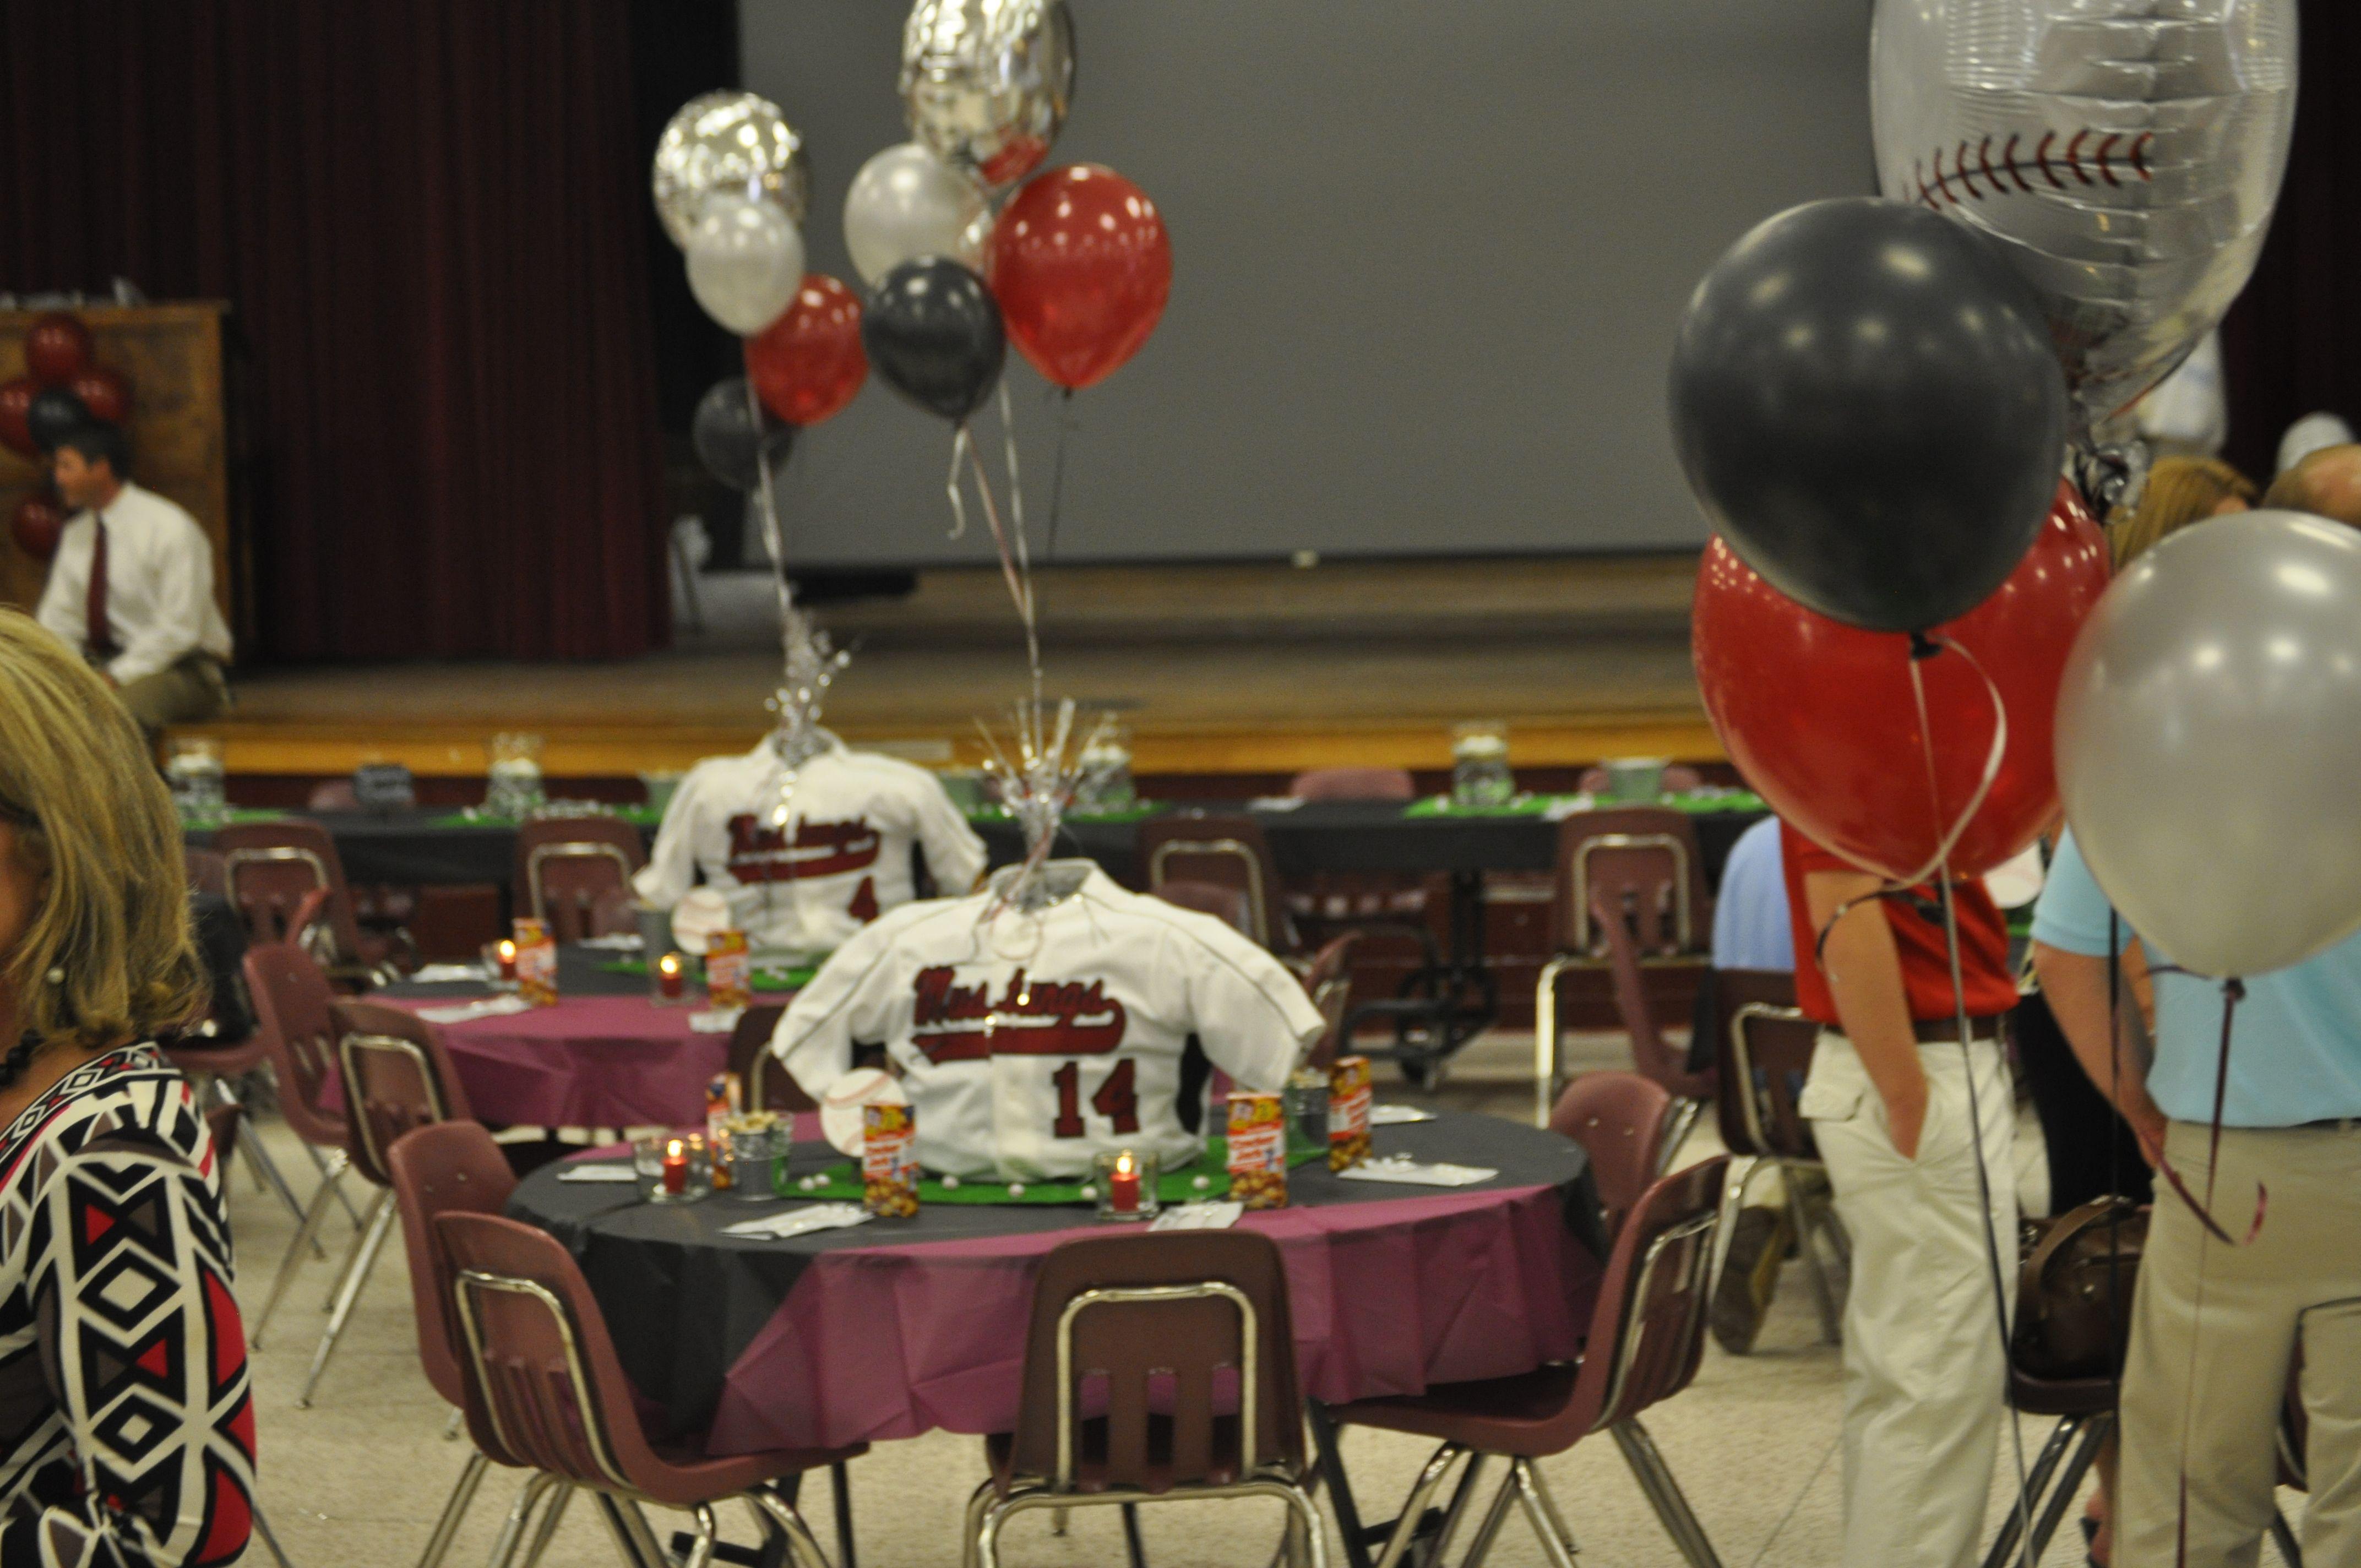 High School Sports Banquet Decorations